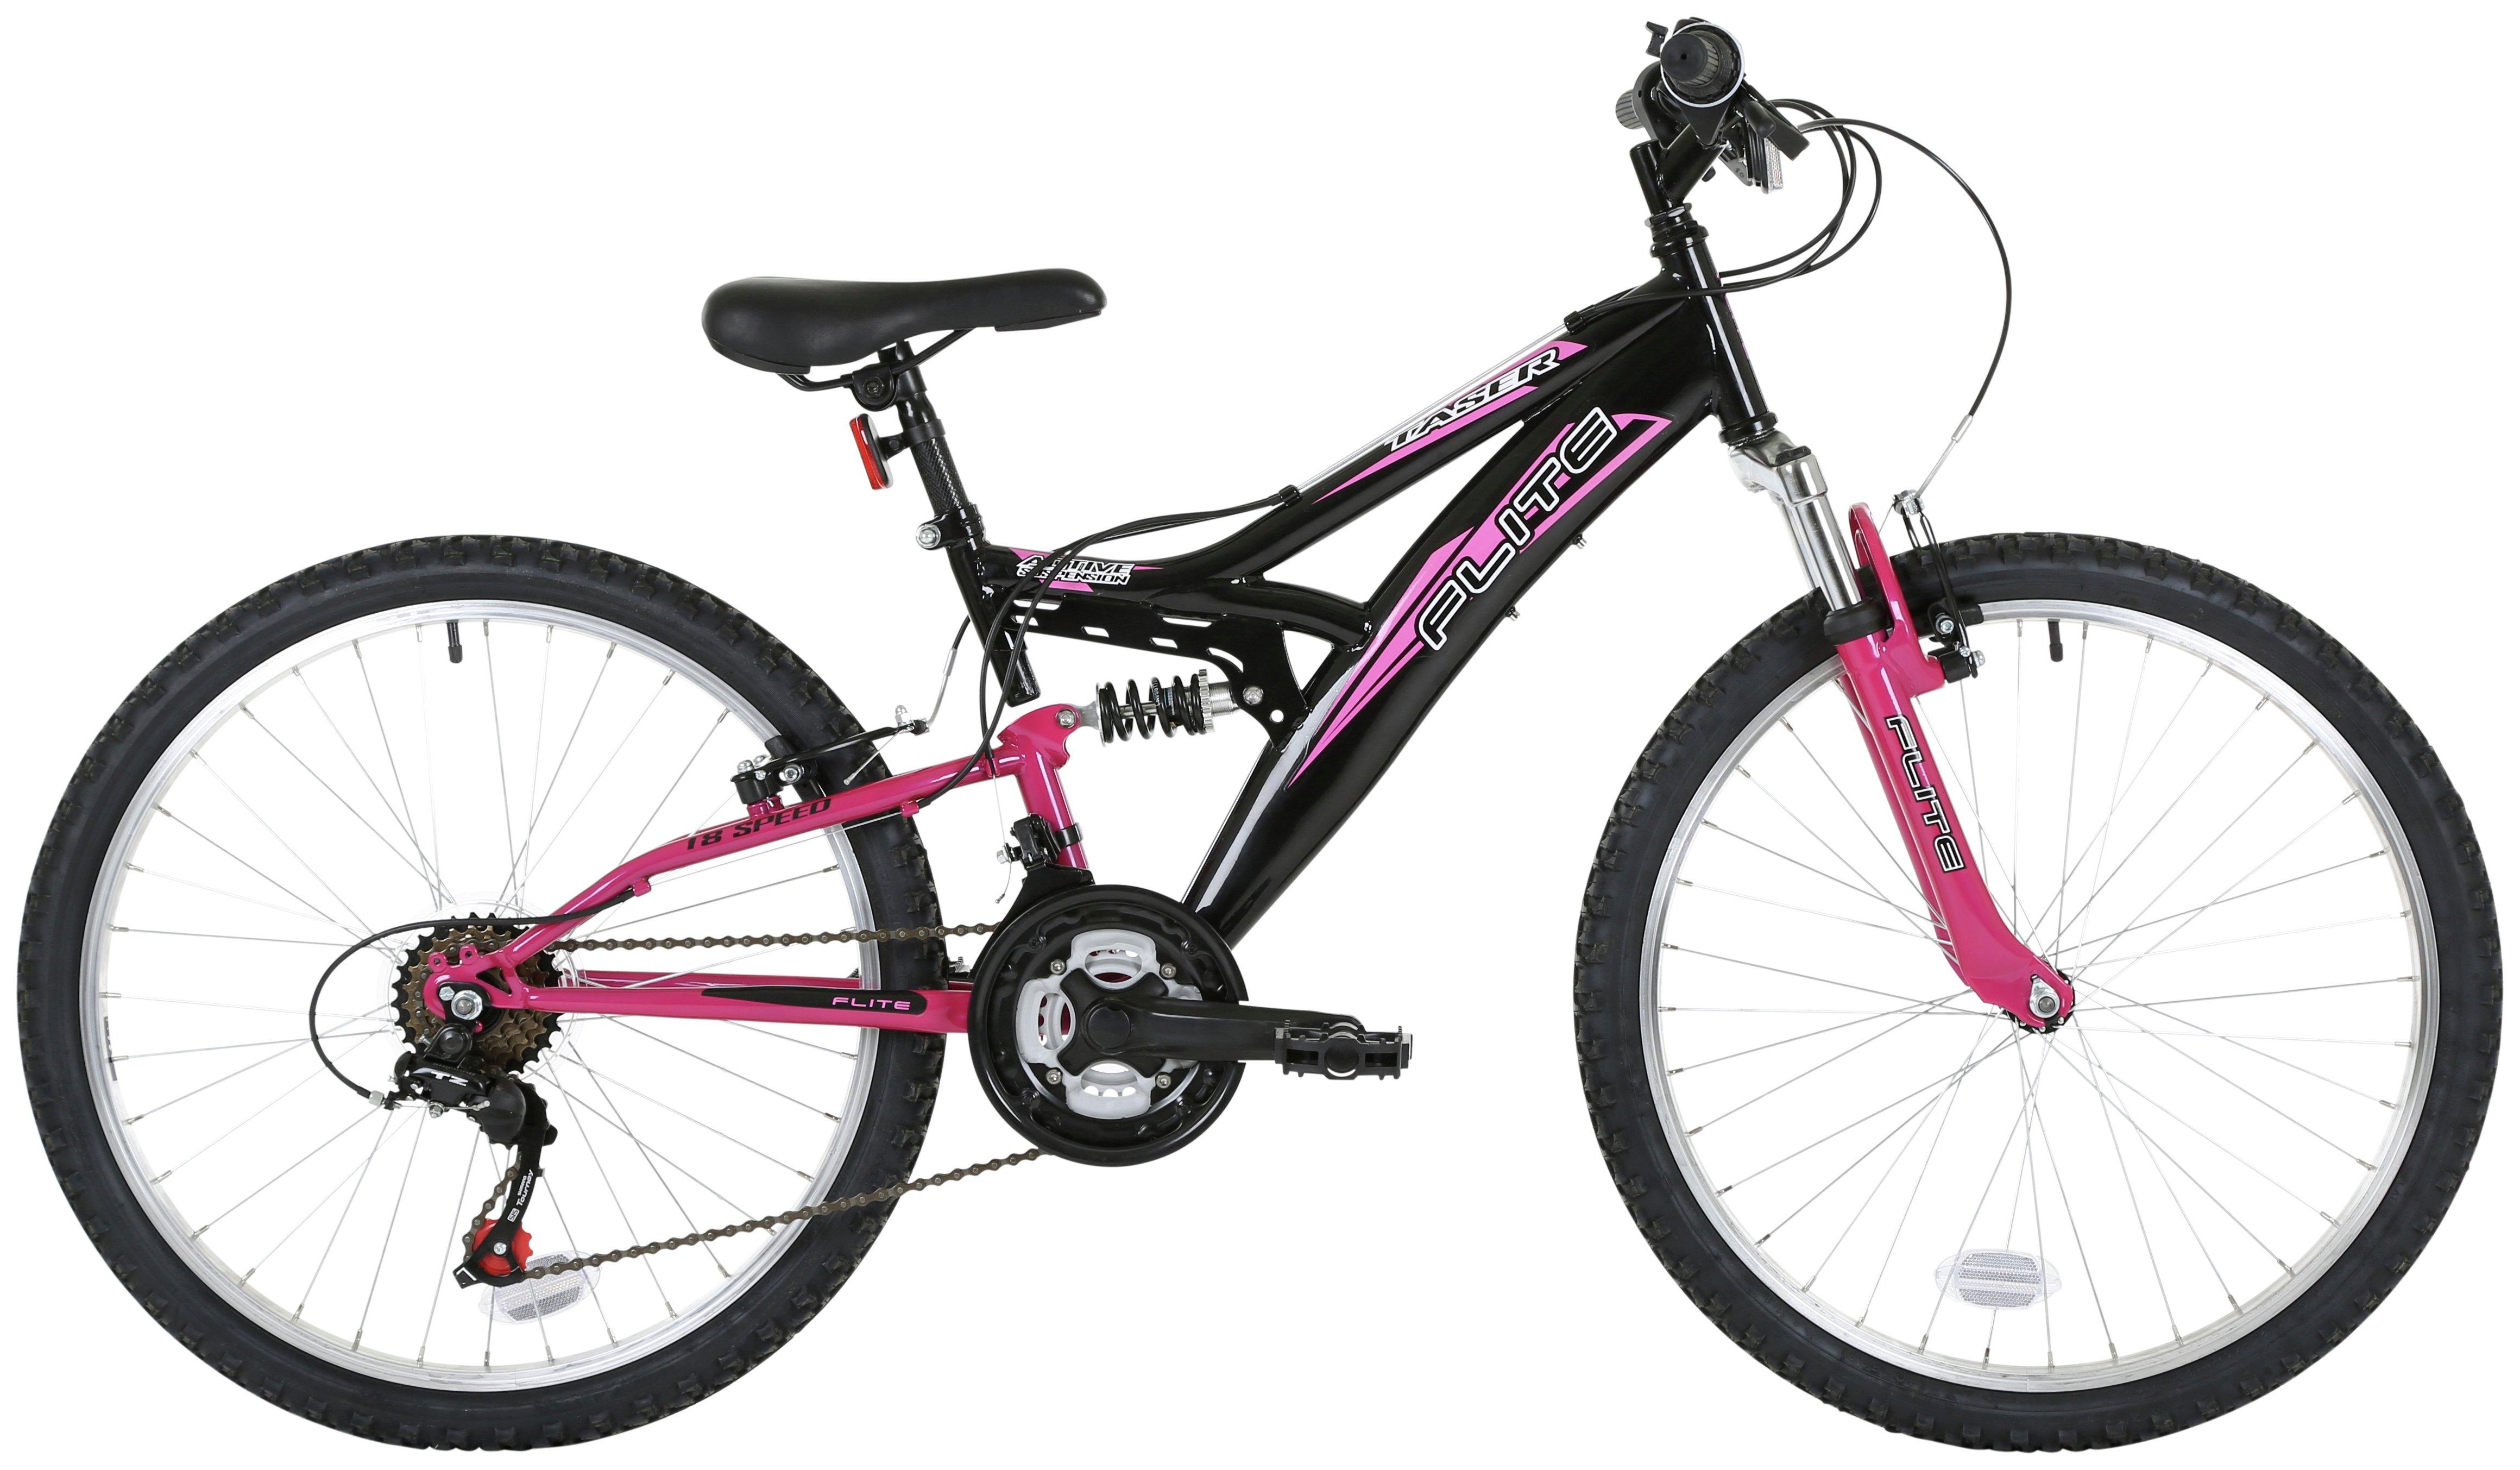 Flite Taser Dual Suspension 14 Inch Bike - Kids